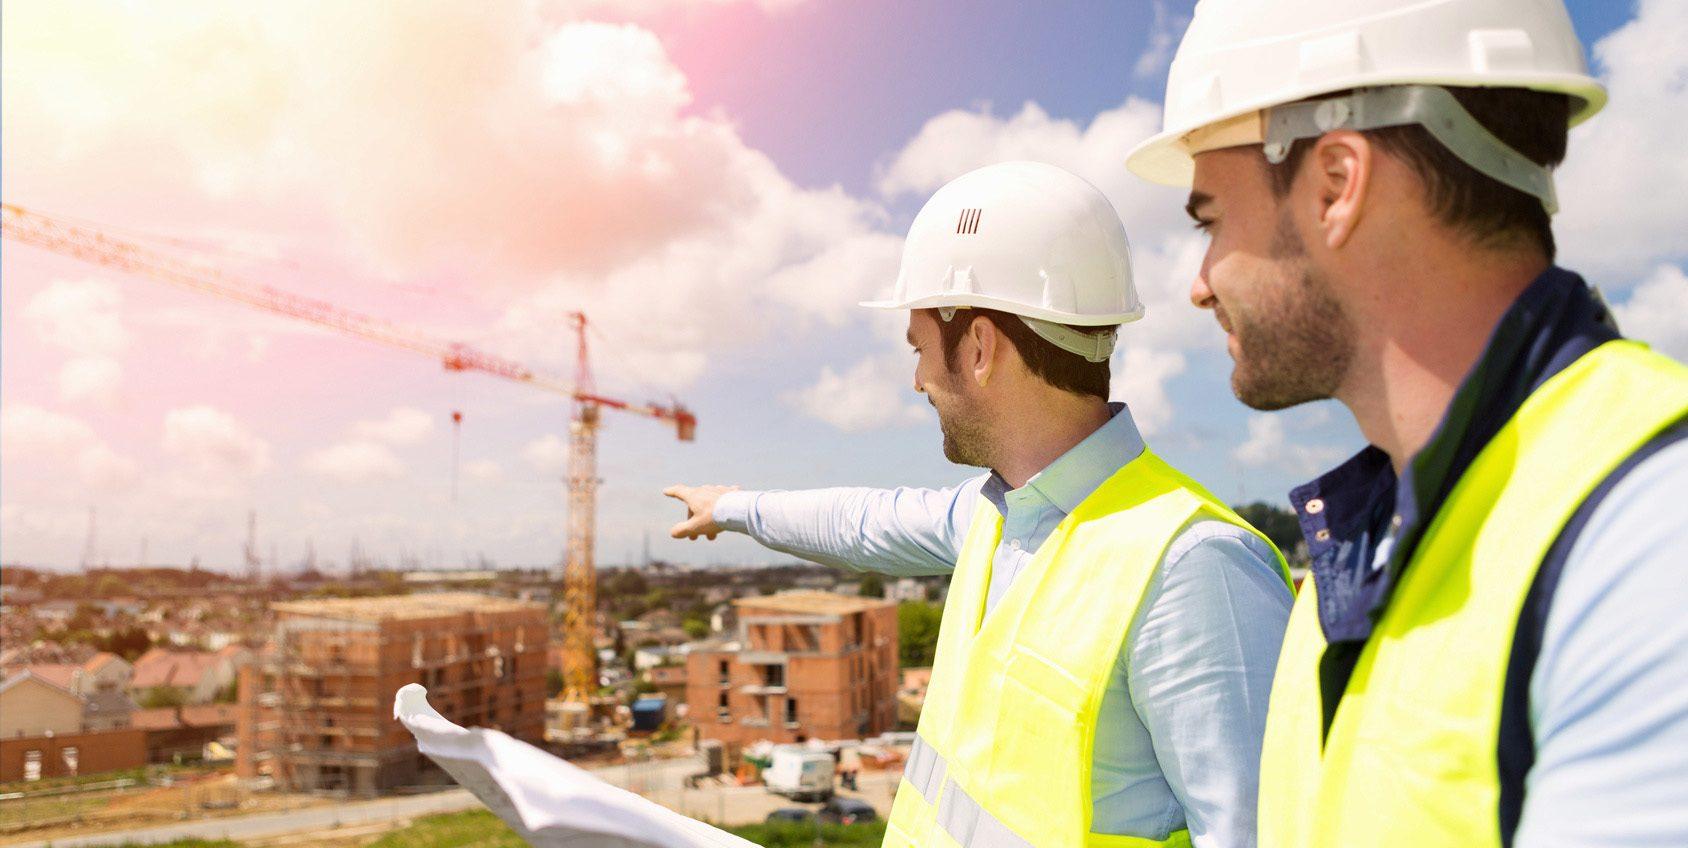 Grupa Inwestor – Nadzory budowlane